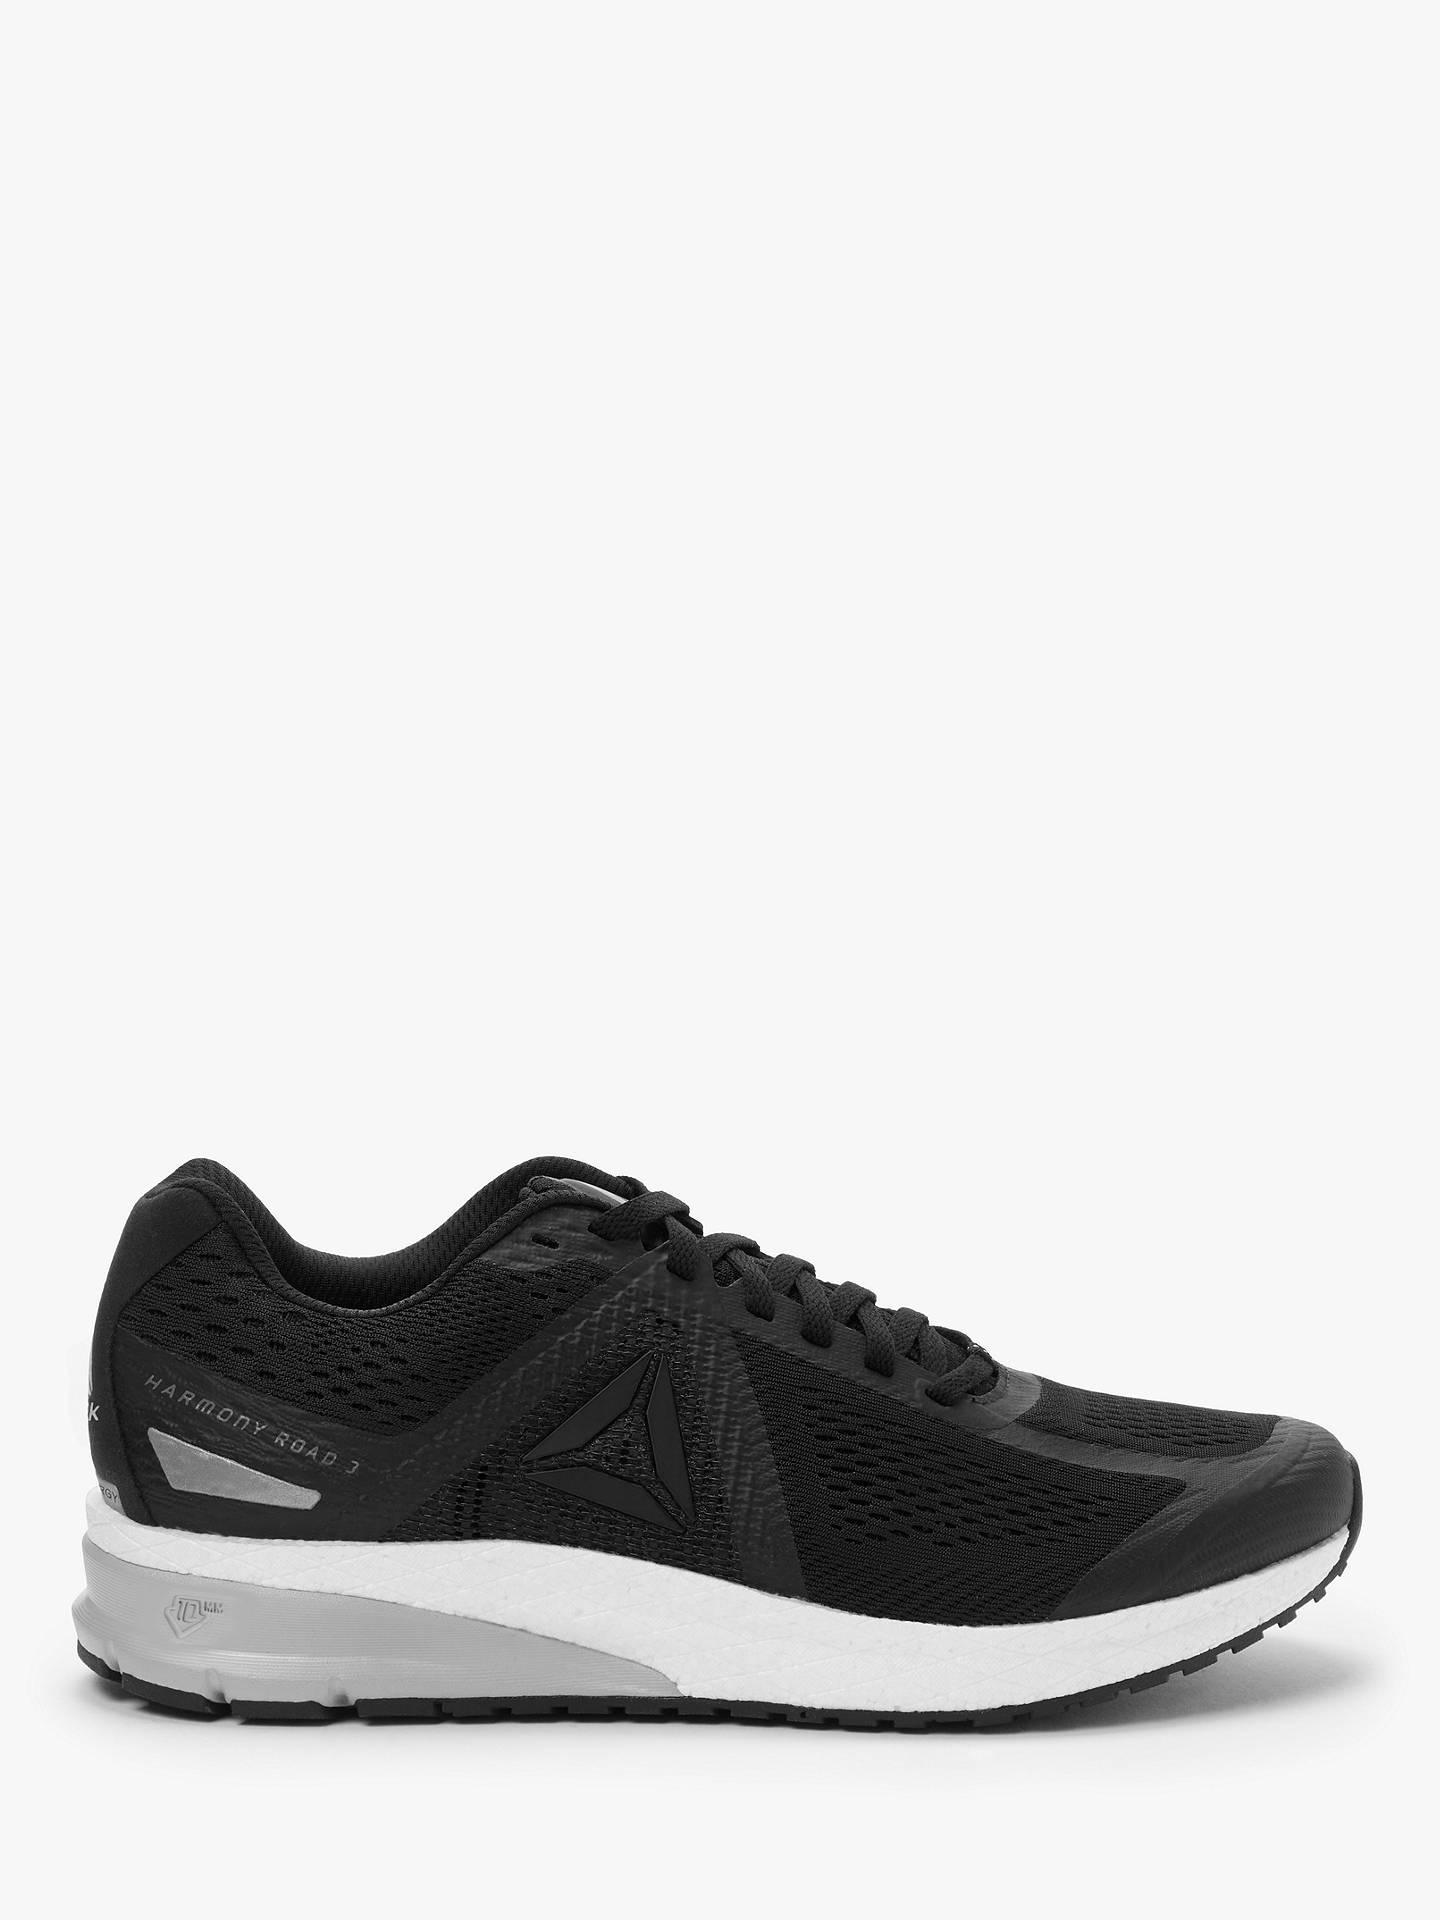 7b1e3d33 Reebok Harmony Road 3.0 Men's Running Shoes, Black/White/Cold Grey